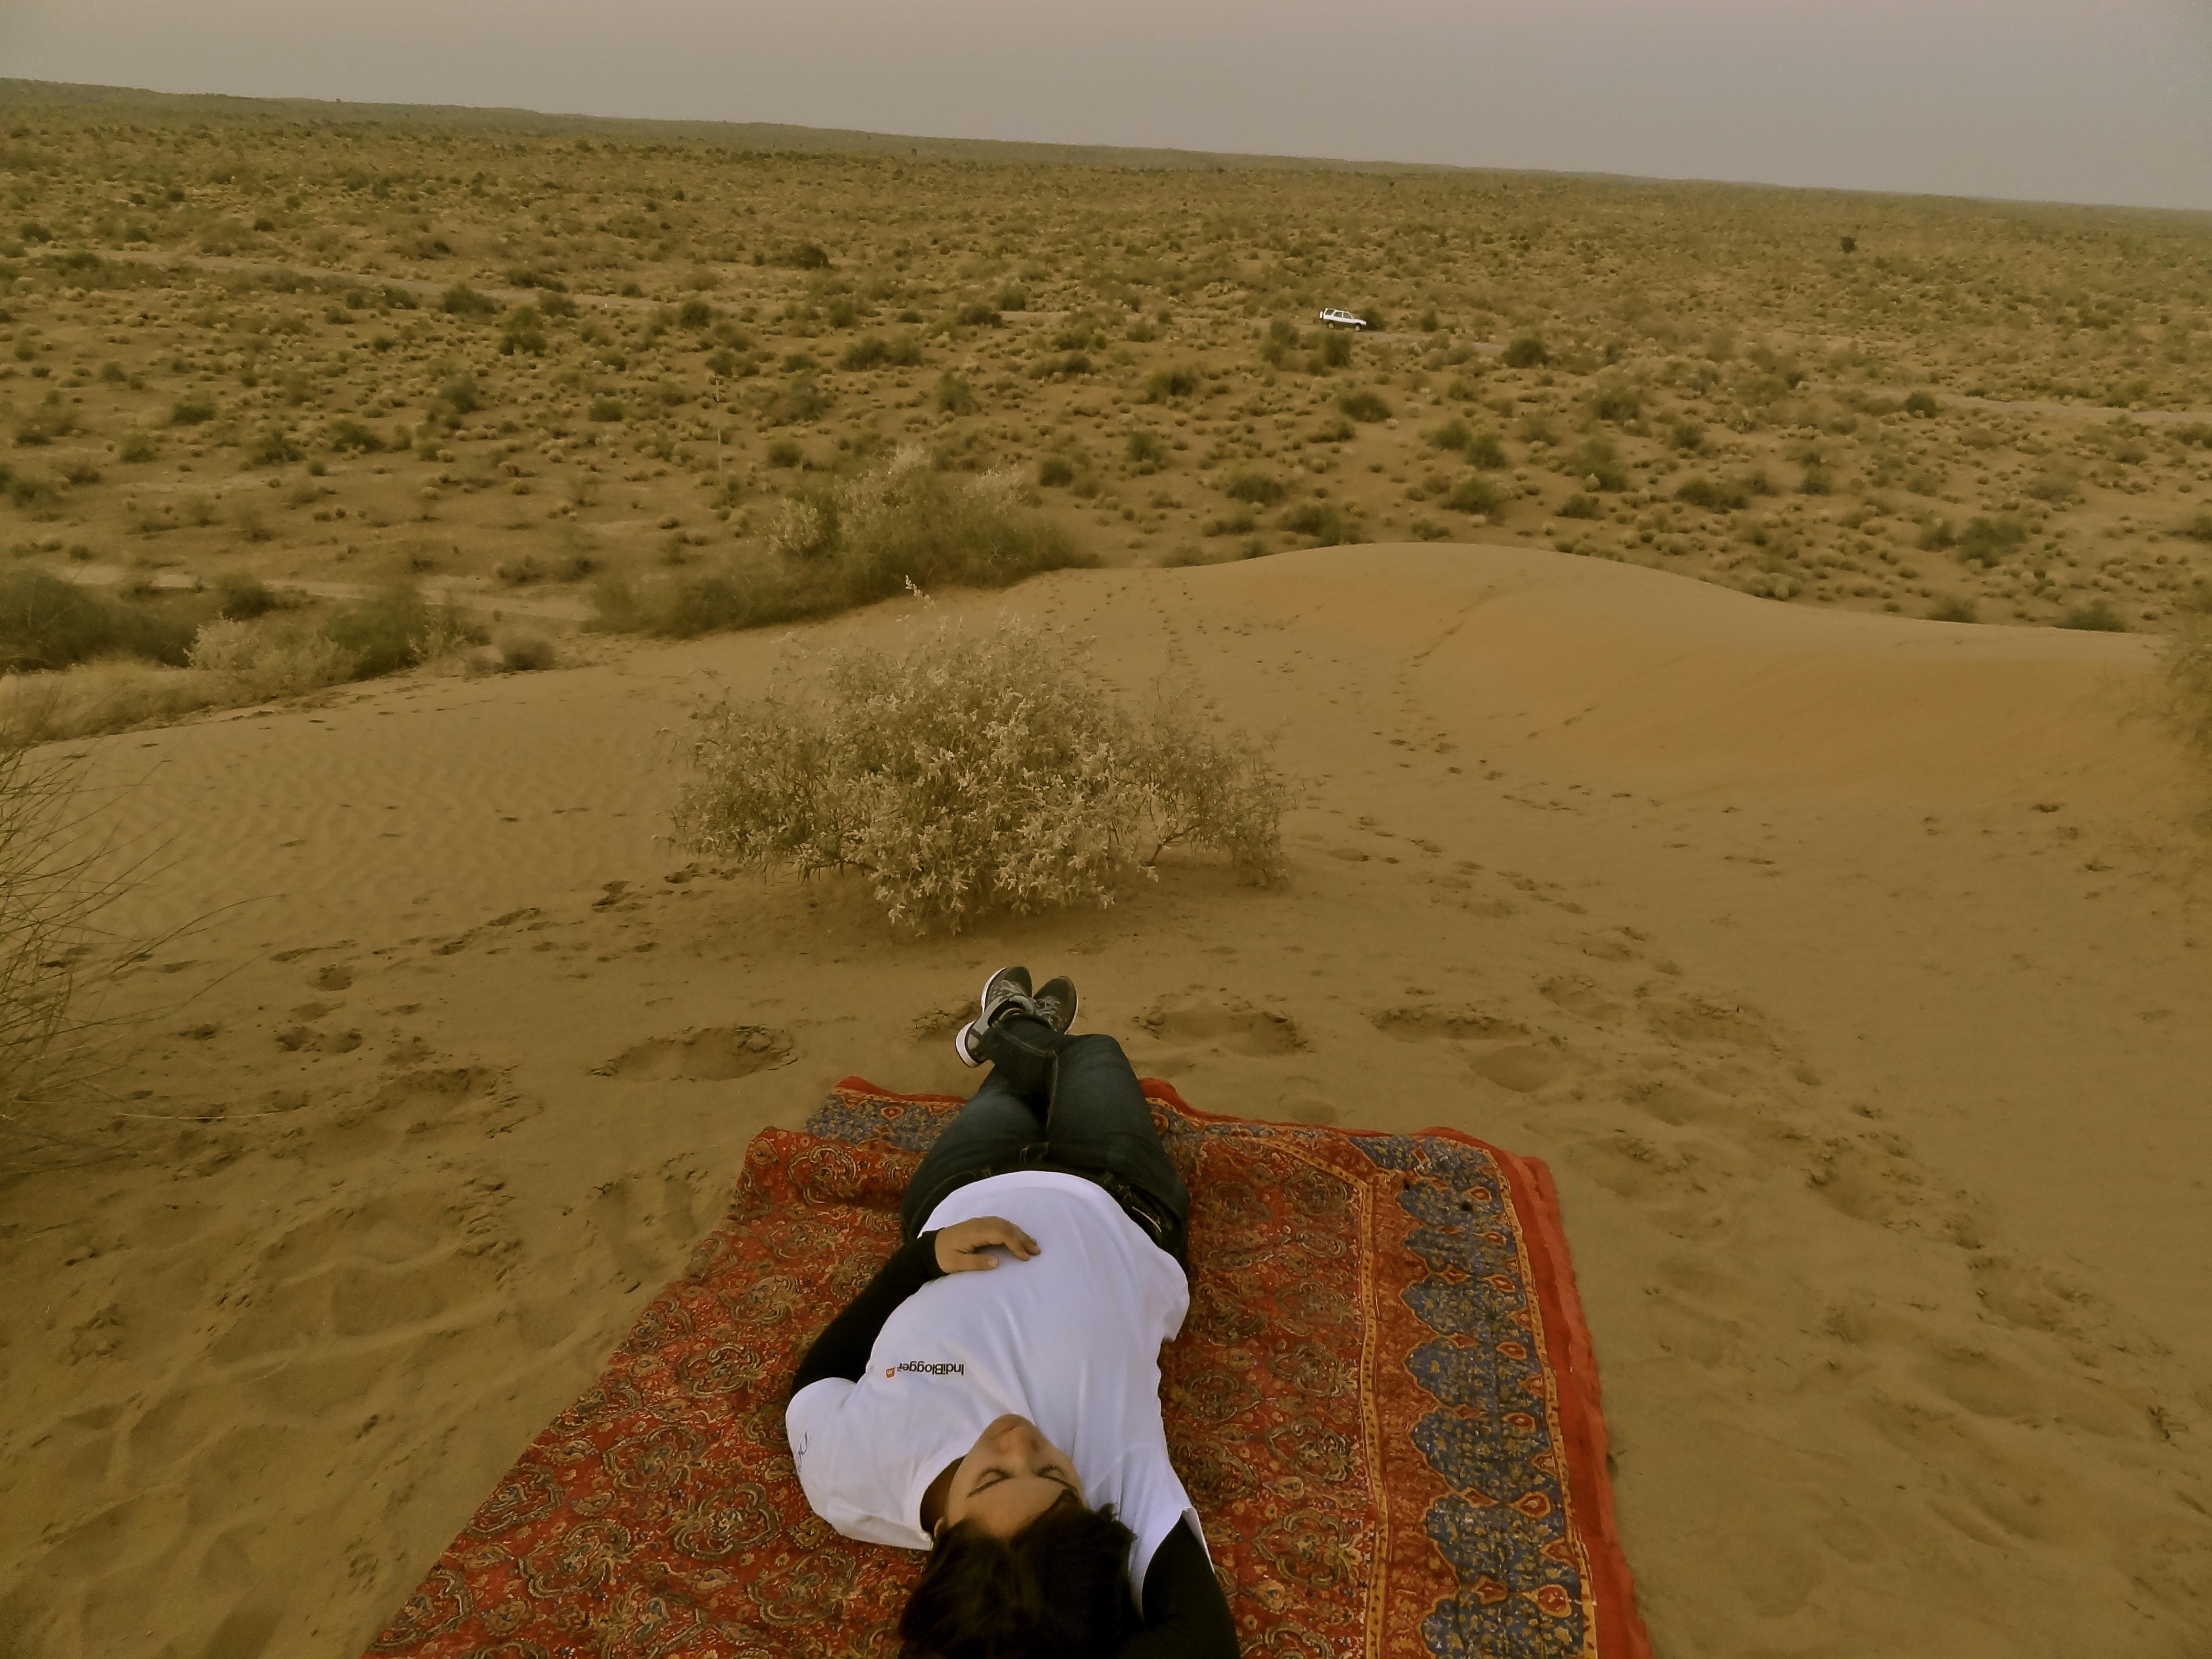 Thar Desert Rajasthan, Sand dunes Rajasthan, Rajasthan desert